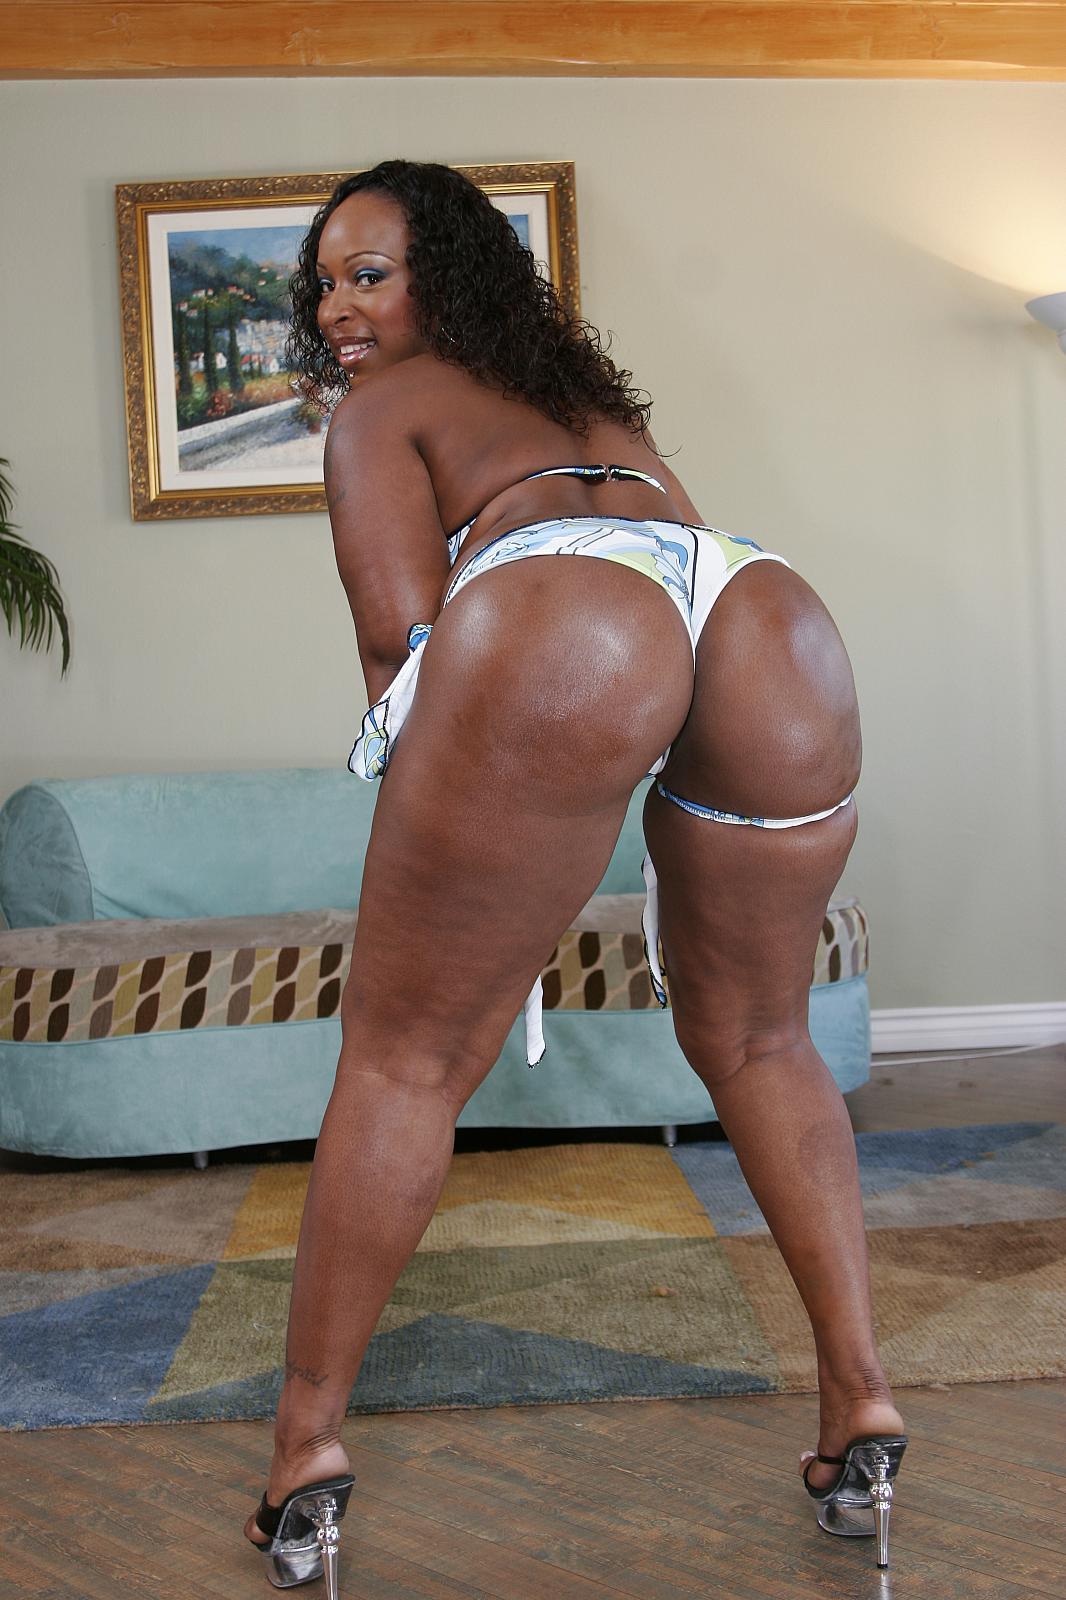 Anal Big Ass Xnxx anal sex pics big ass ebony babe black sucked her man hard